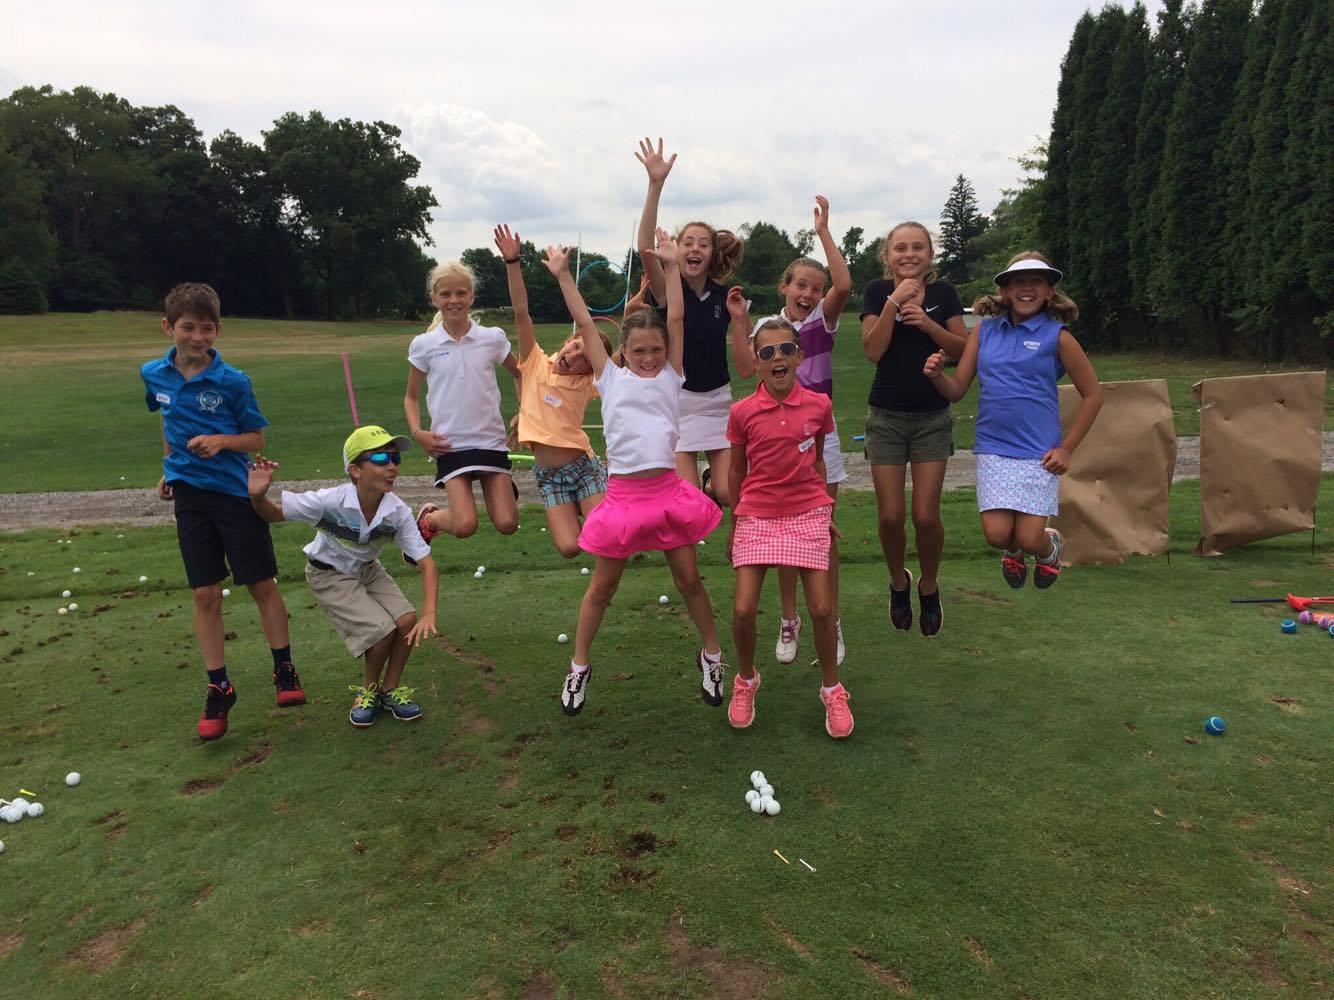 Vikki Valentine Vanderpool Golf Letu0027s Grow Golf Together